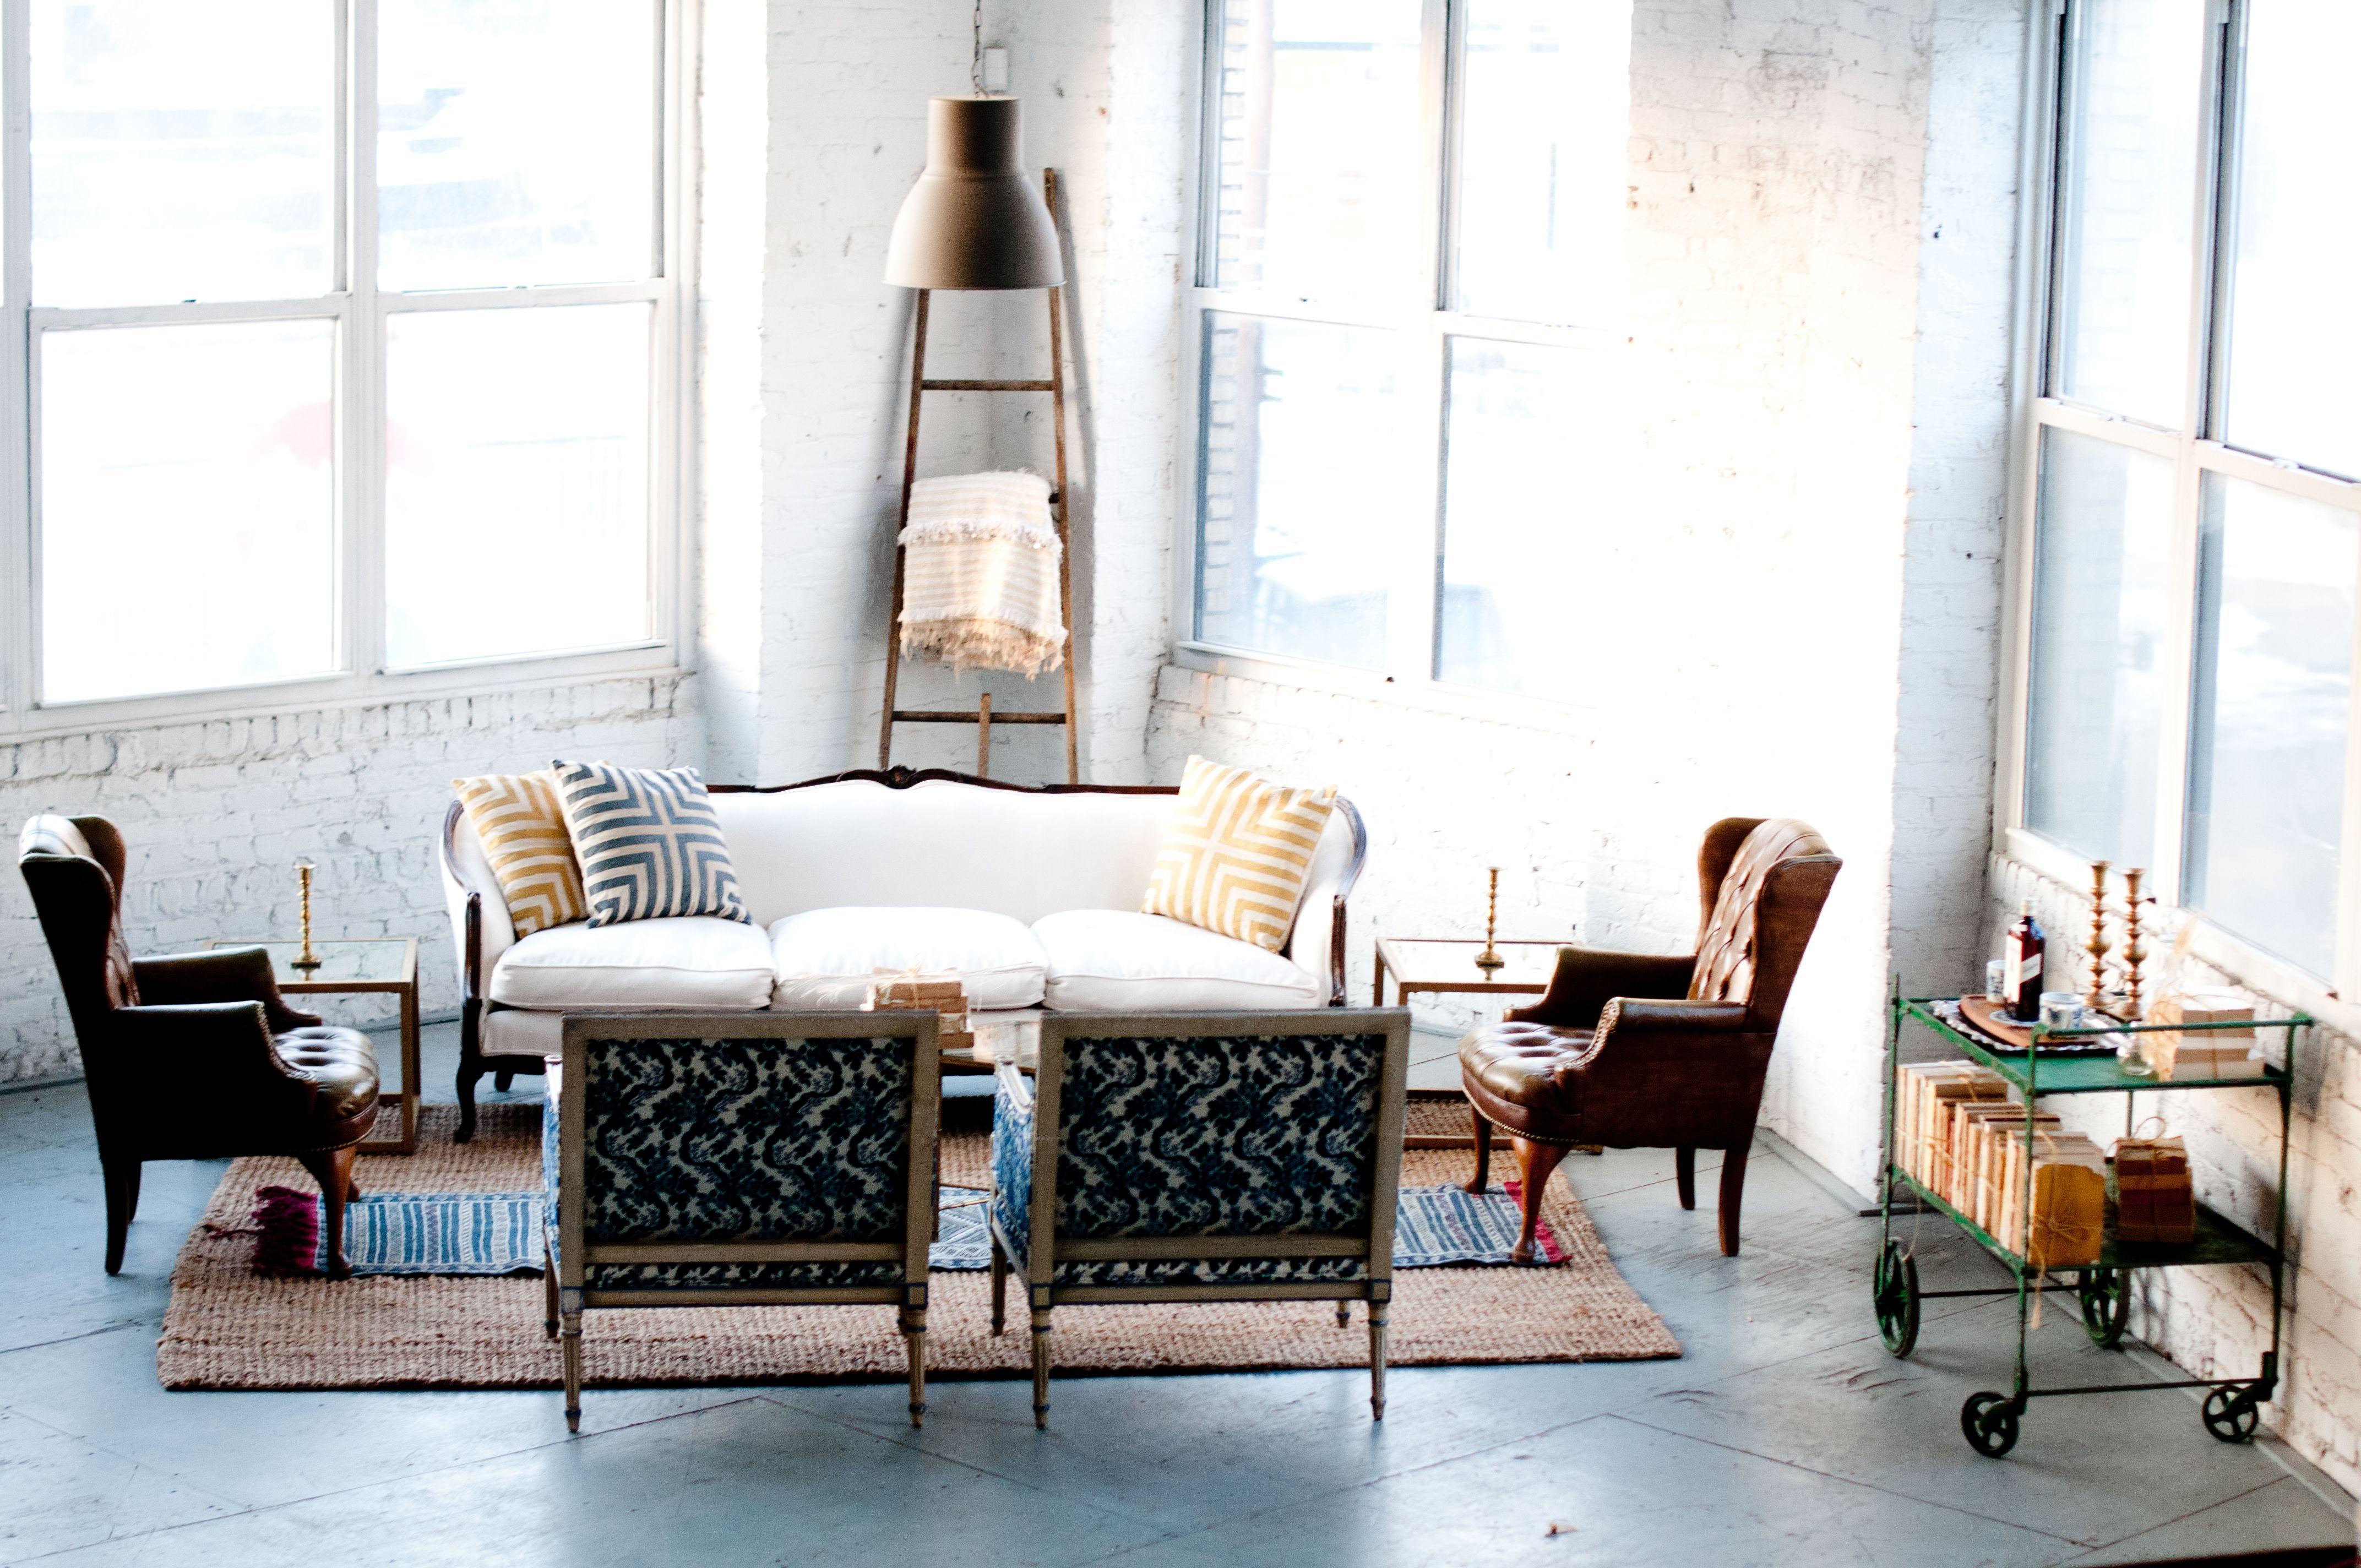 The Jack White sofa looks so cozy in the back corner of our studio ...